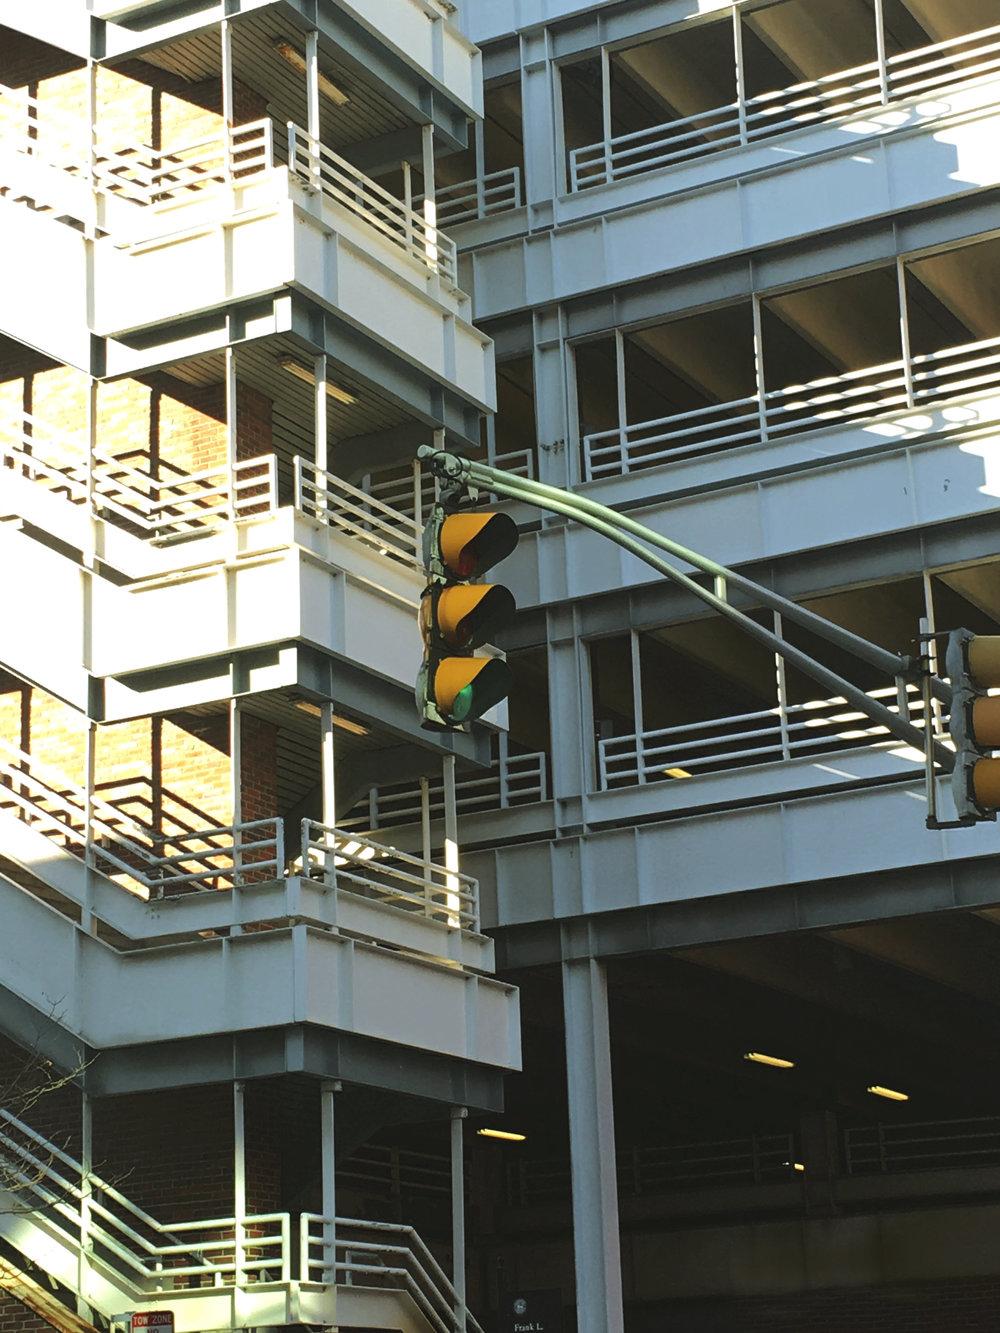 streetlightgreen2.jpg